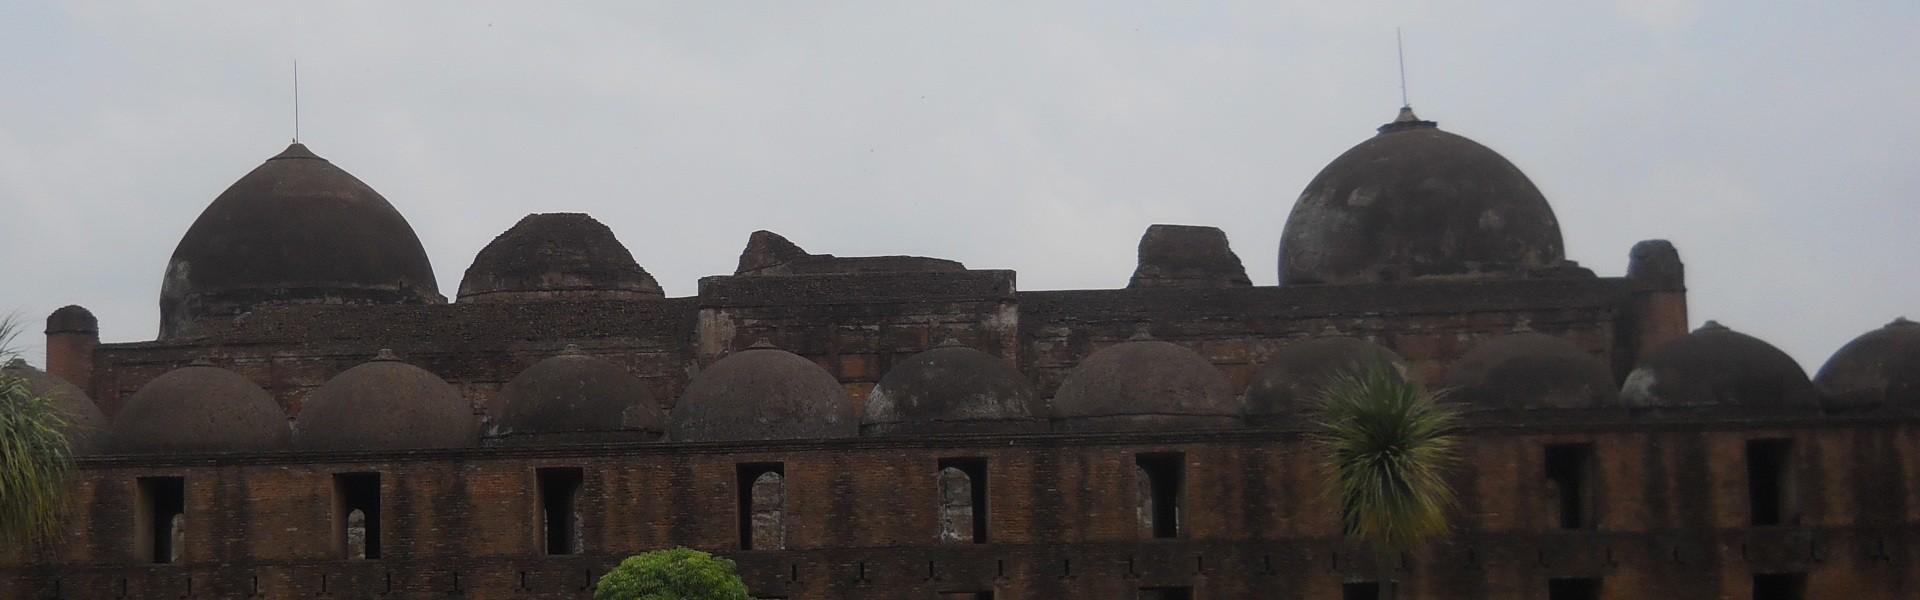 Katra_Masjid_(Katra_Mosque)_-_Front1